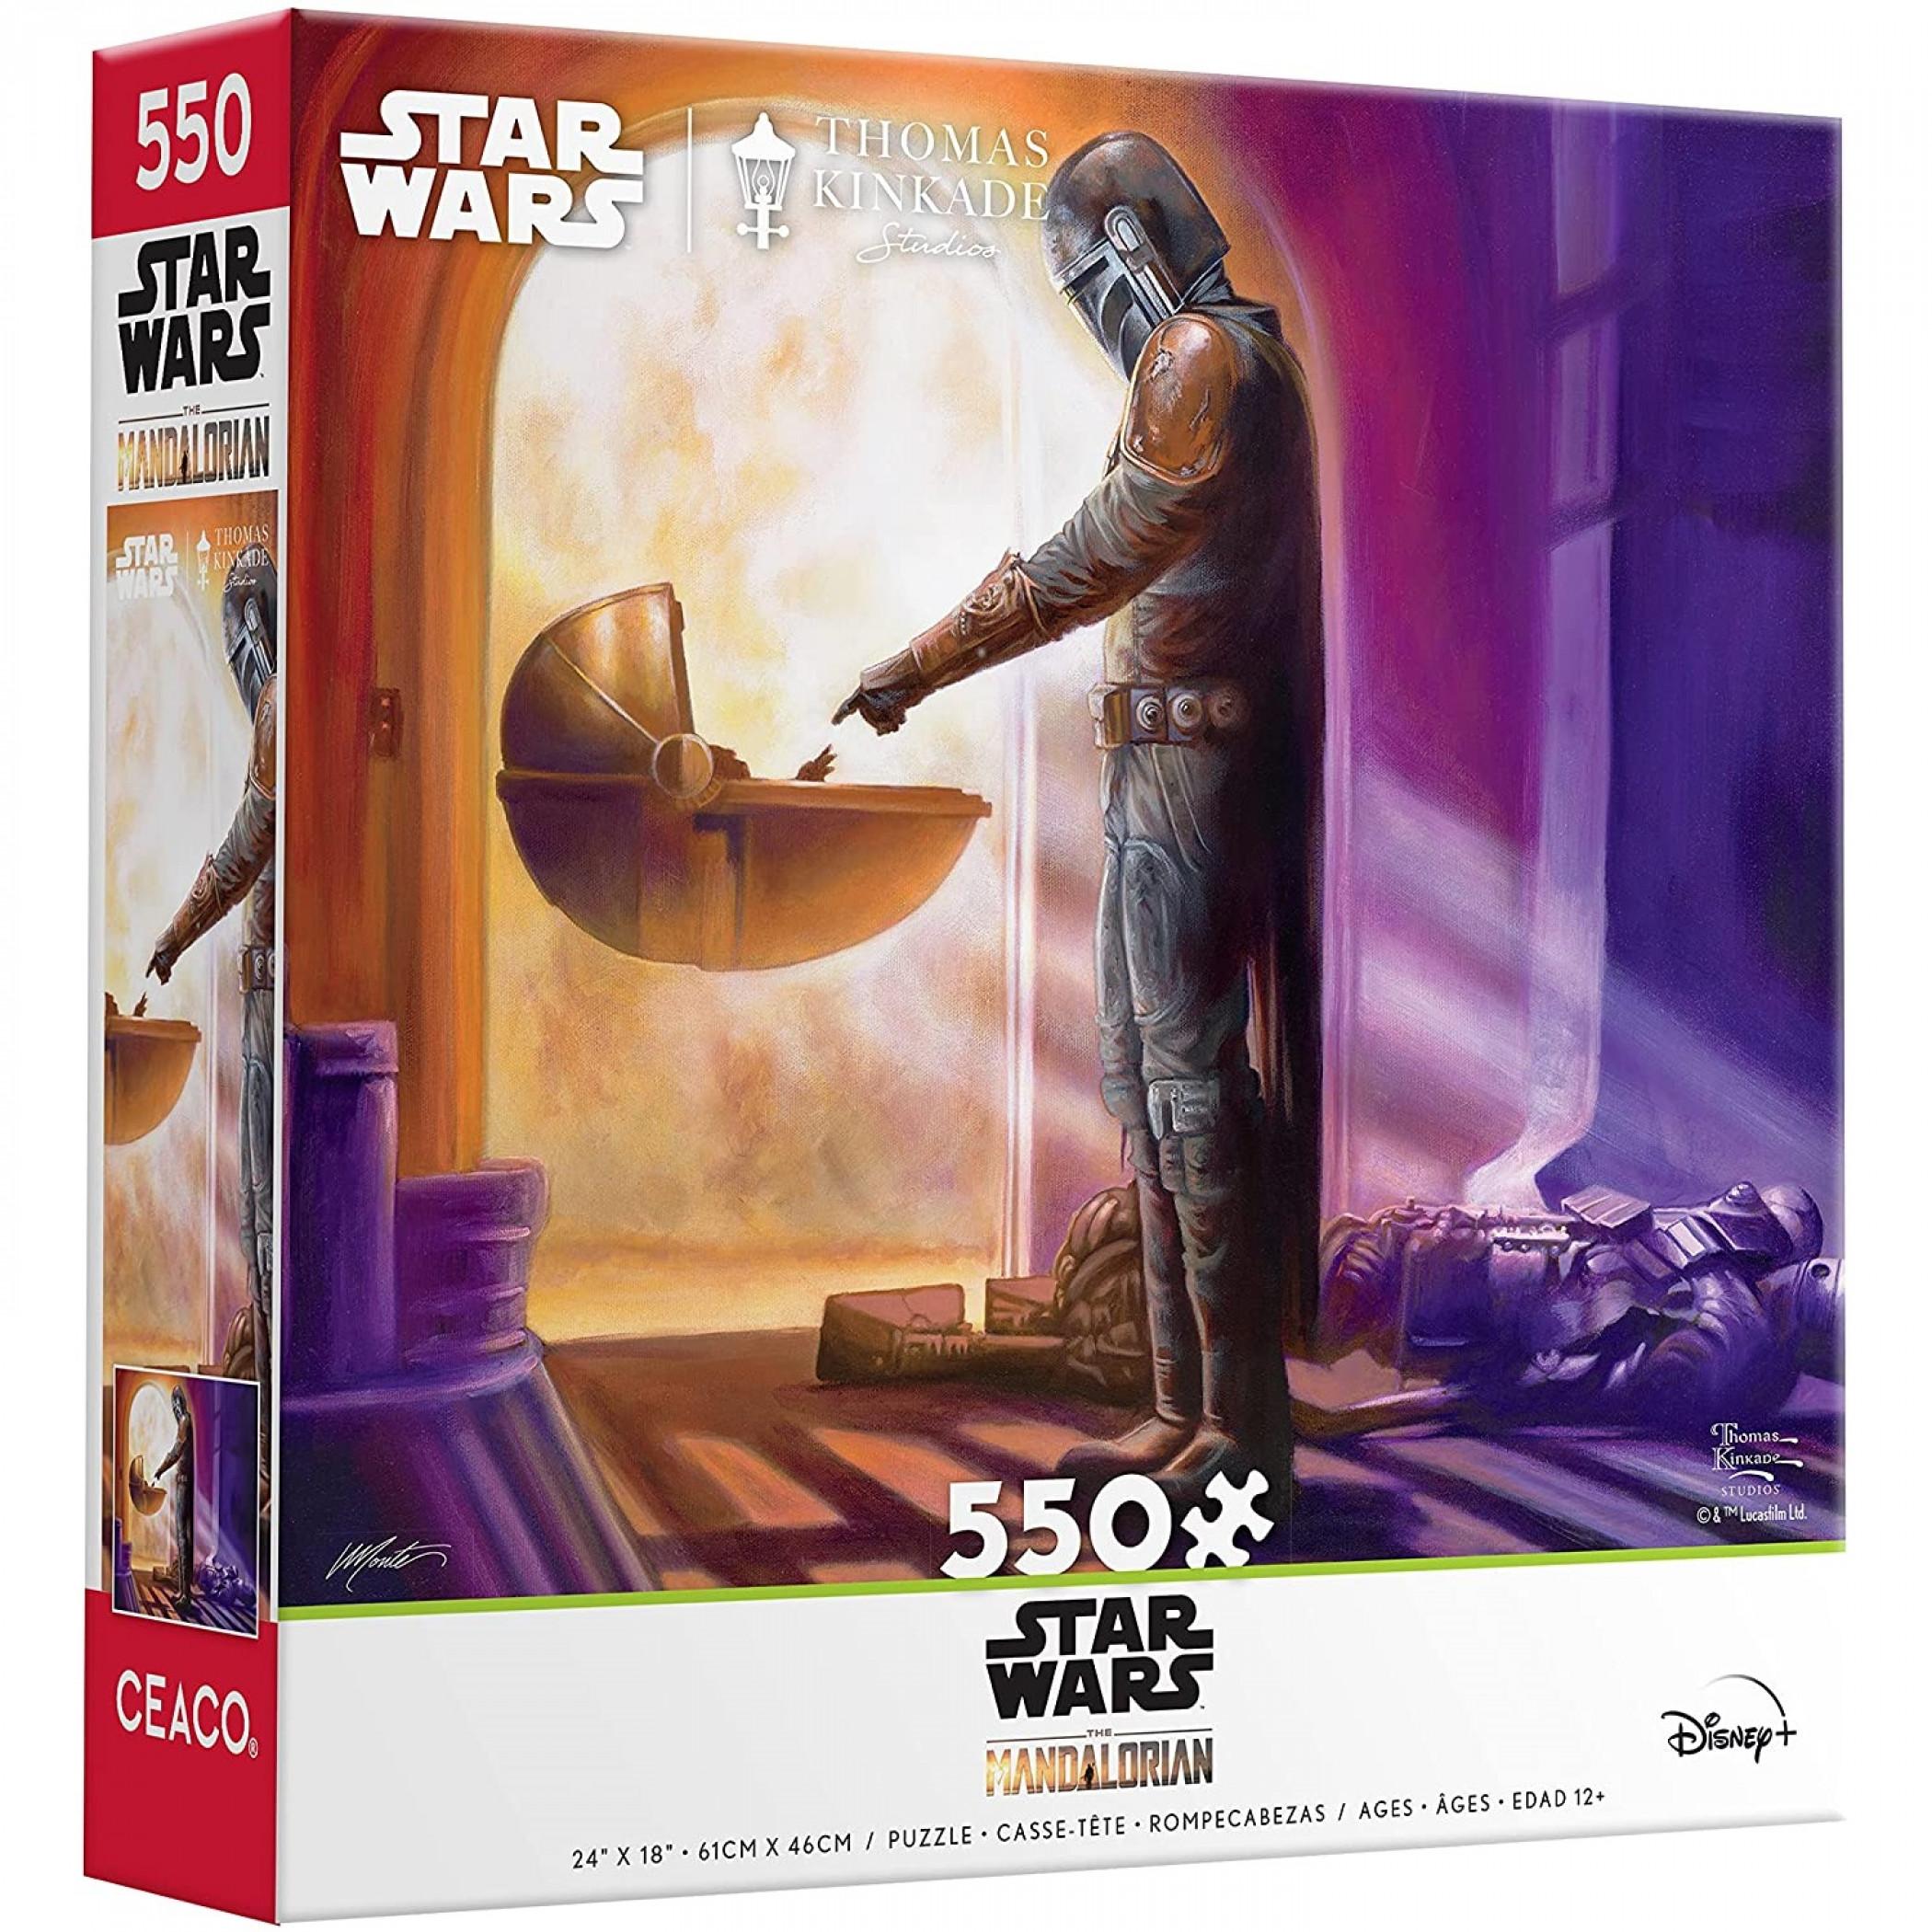 Star Wars The Mandalorian Meets The Child Grogu 550 Piece Puzzle